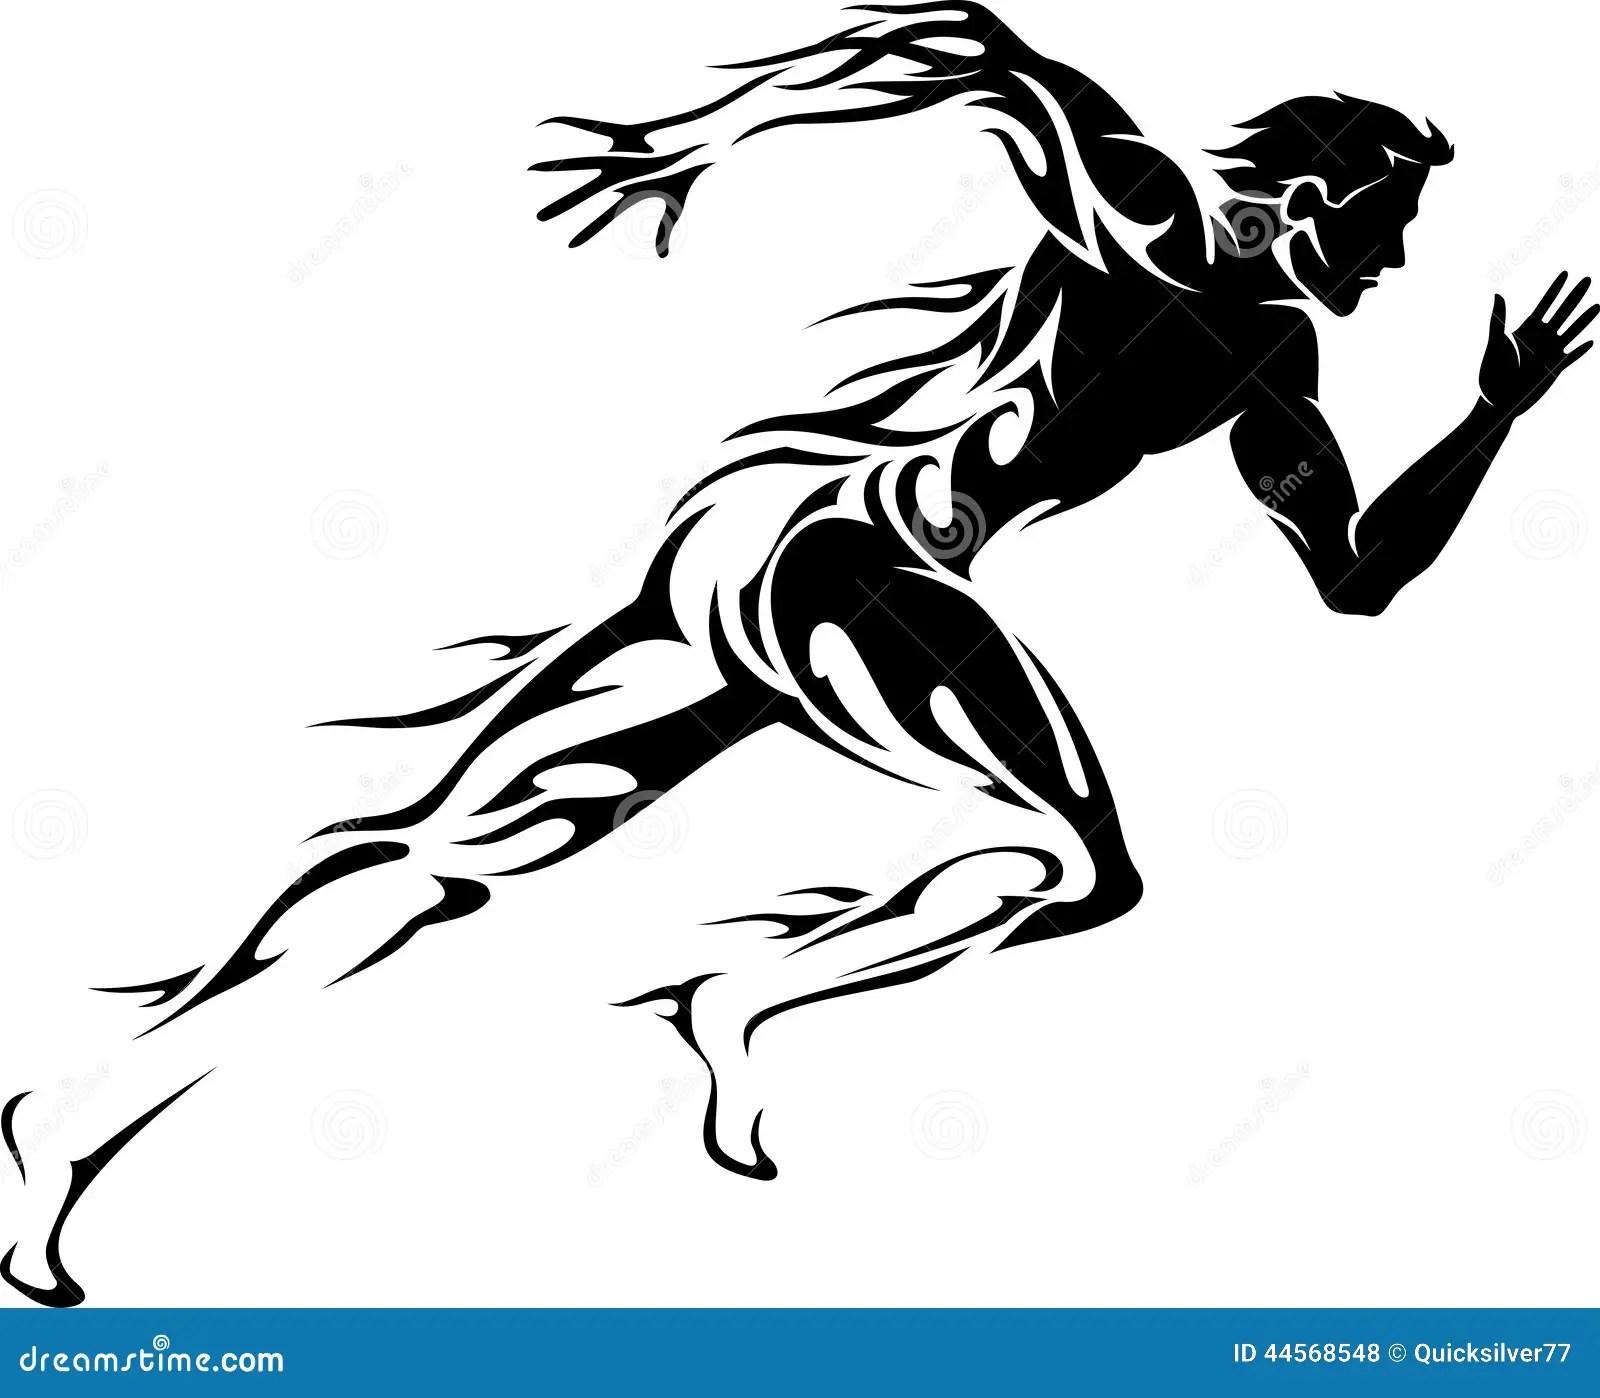 Runner Cartoons Illustrations Amp Vector Stock Images